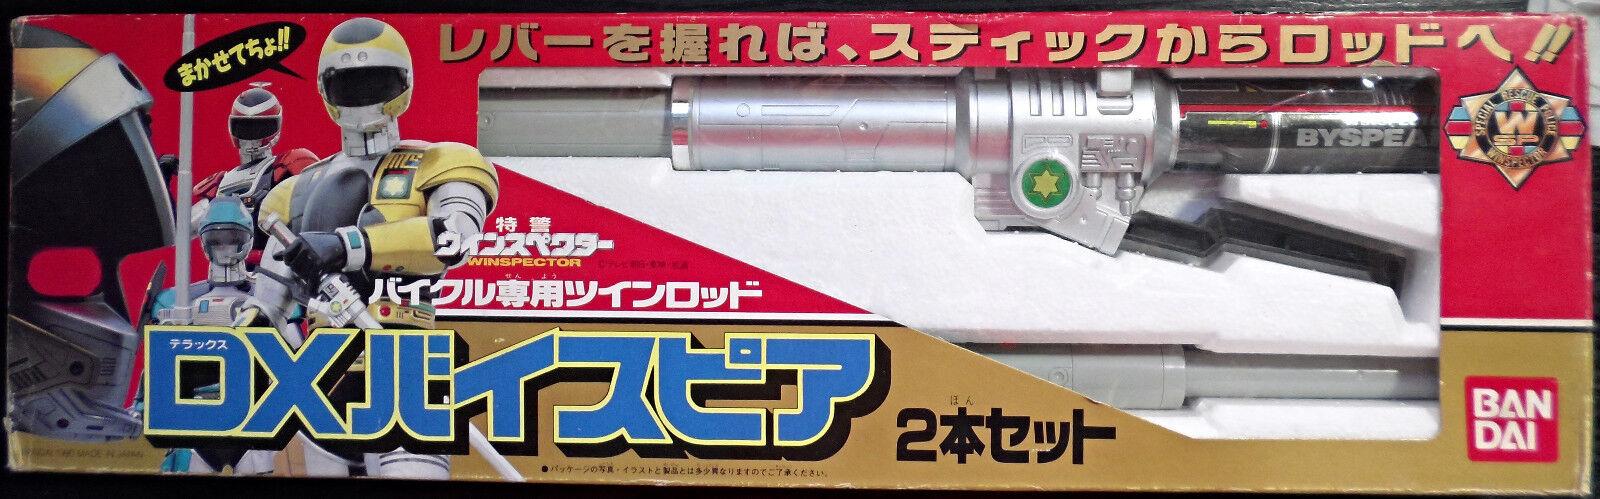 1990 Special Rescue Police Tokkei Winspector DX Bikel Bispear chogokin Popy NY